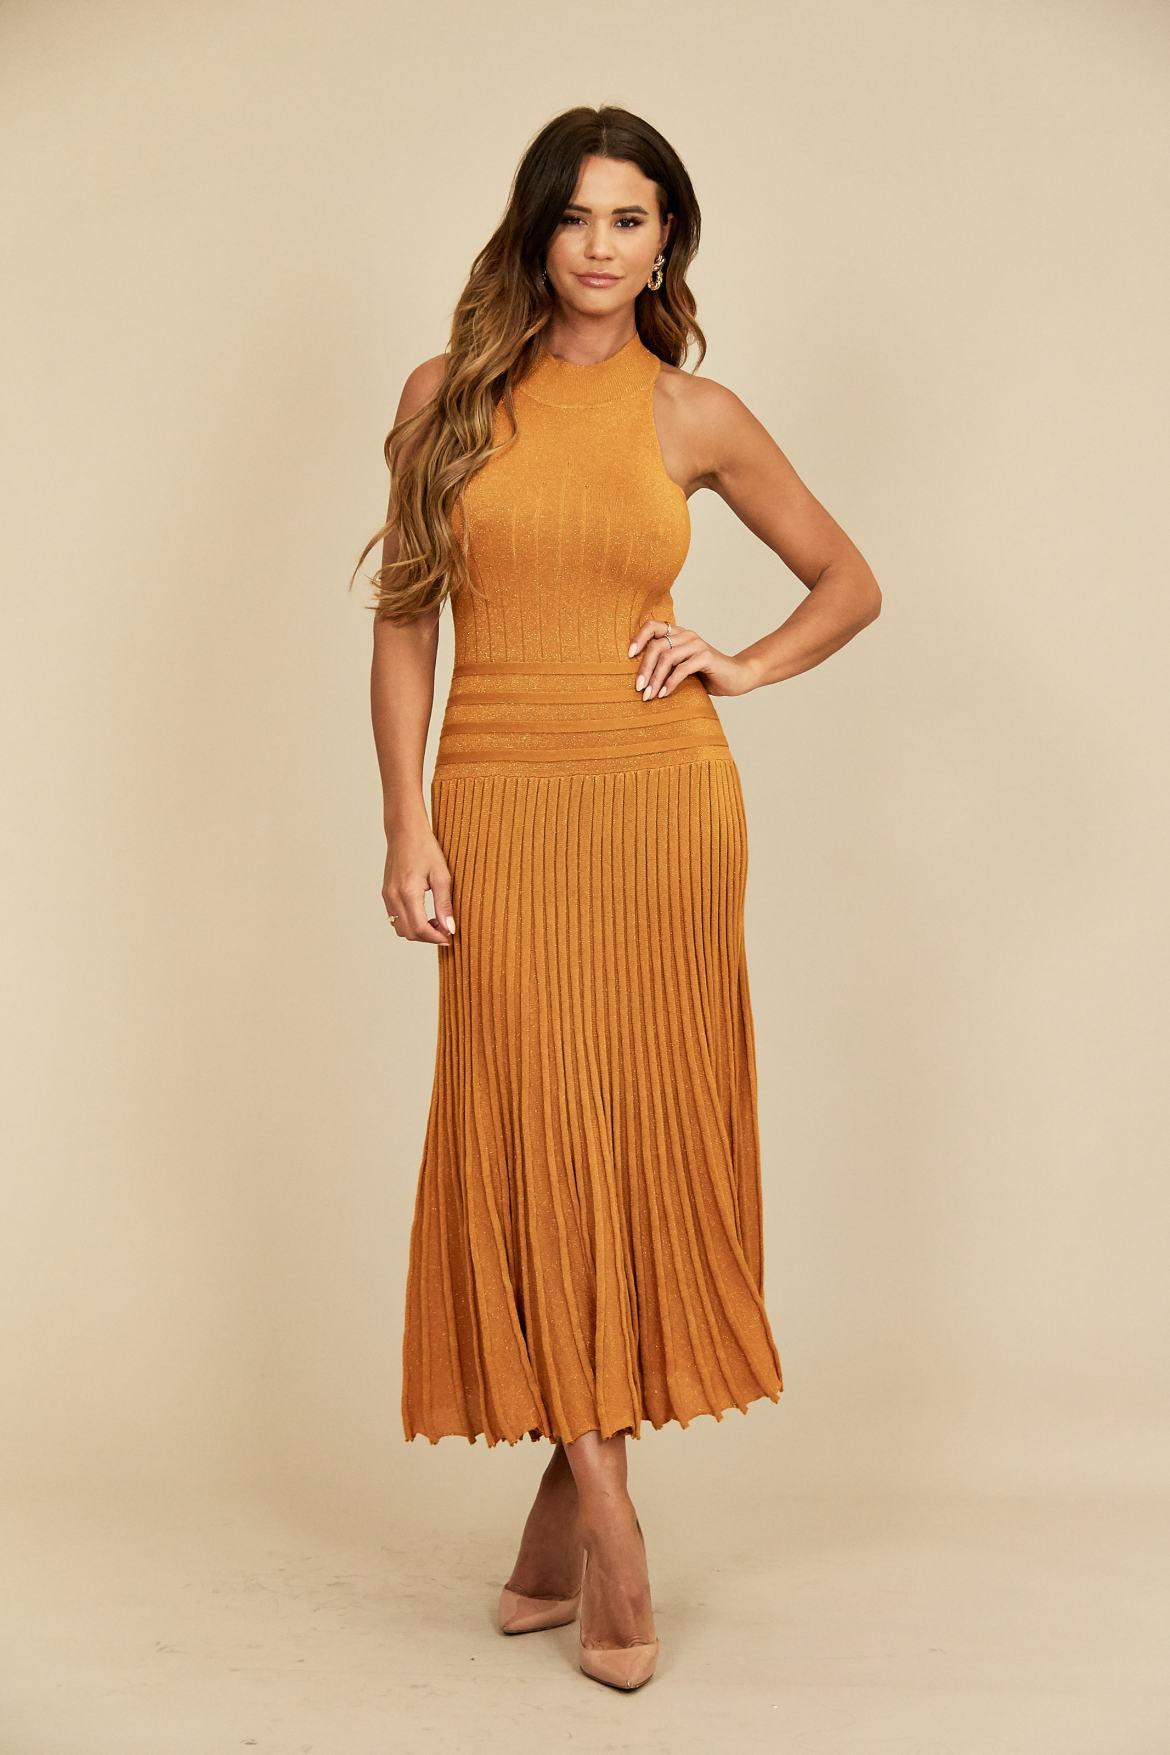 Model wears gold metallic high neck midi dress with pleated skirt